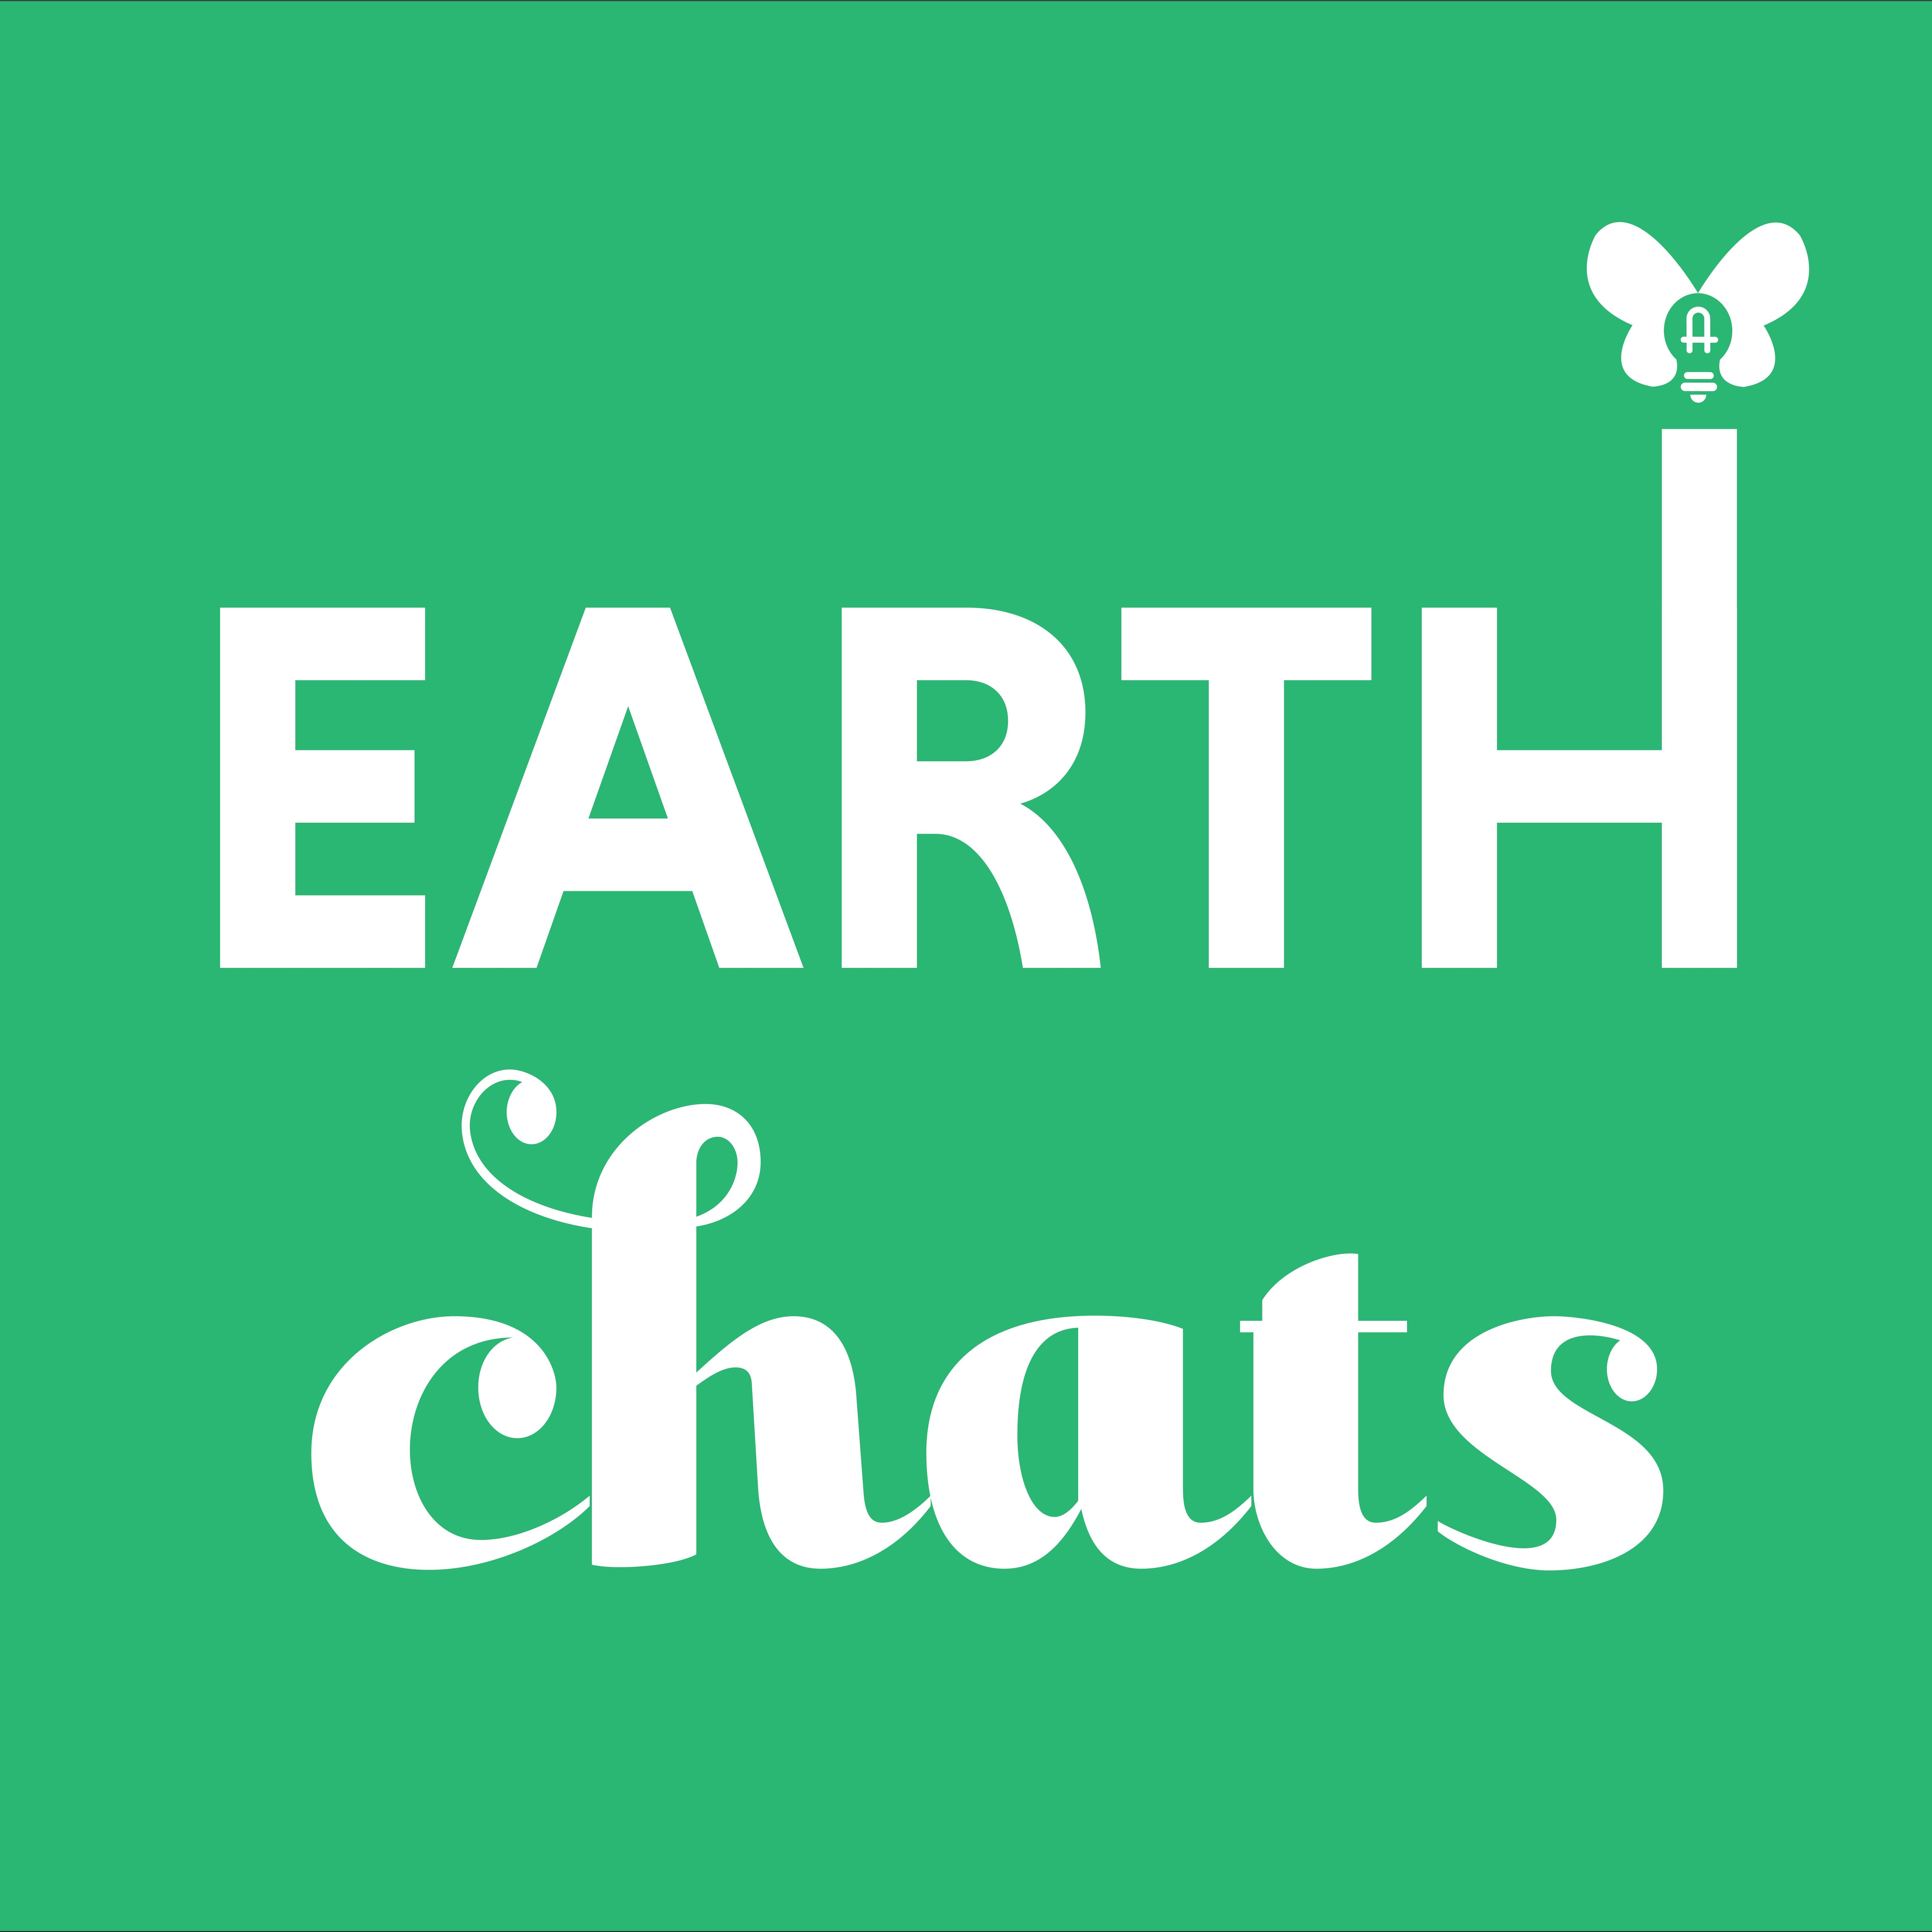 Earth Chats